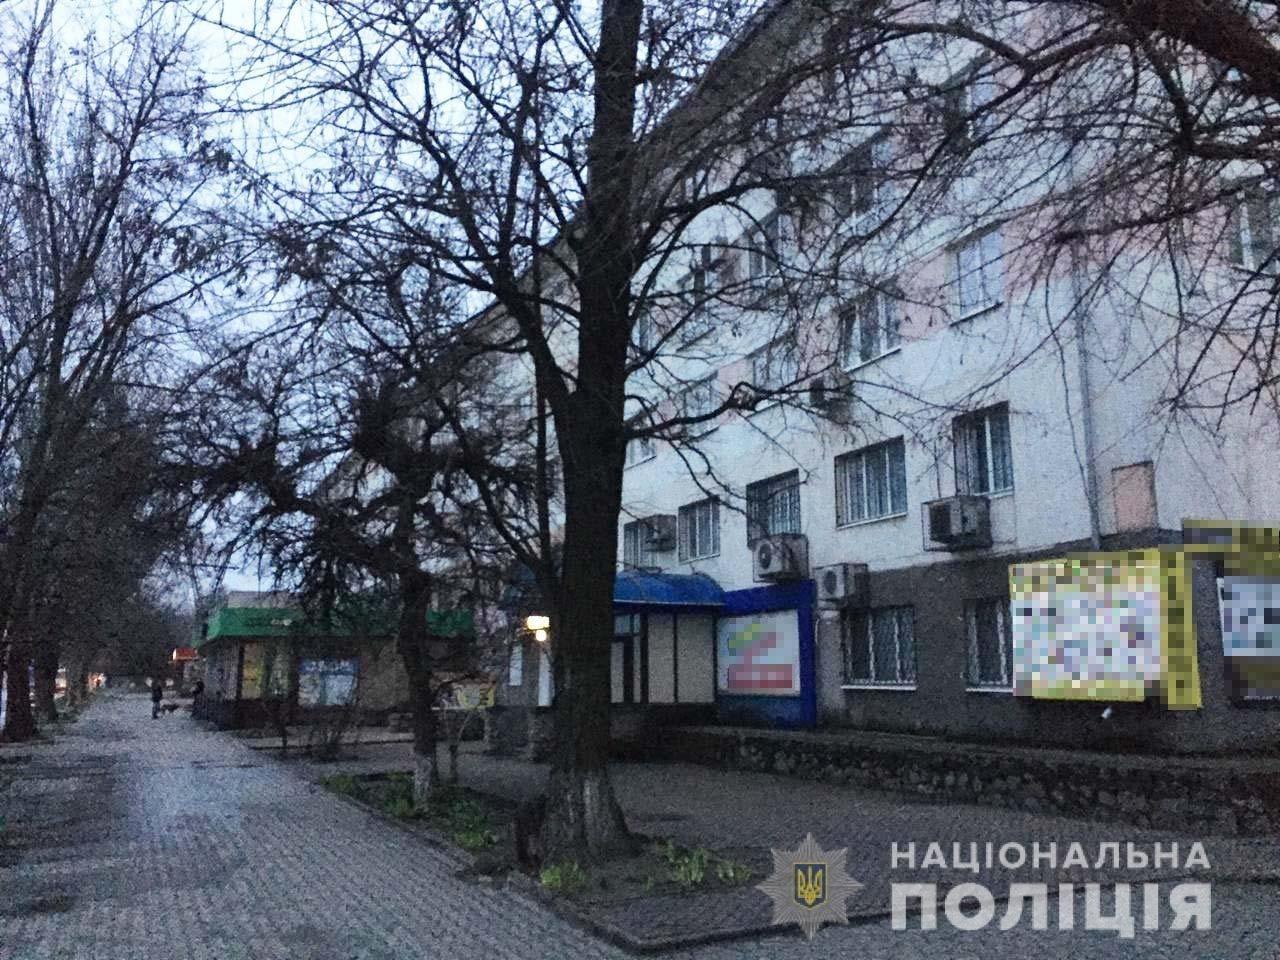 Под Днепром 25-летний мужчина зверски убил женщину, фото-1